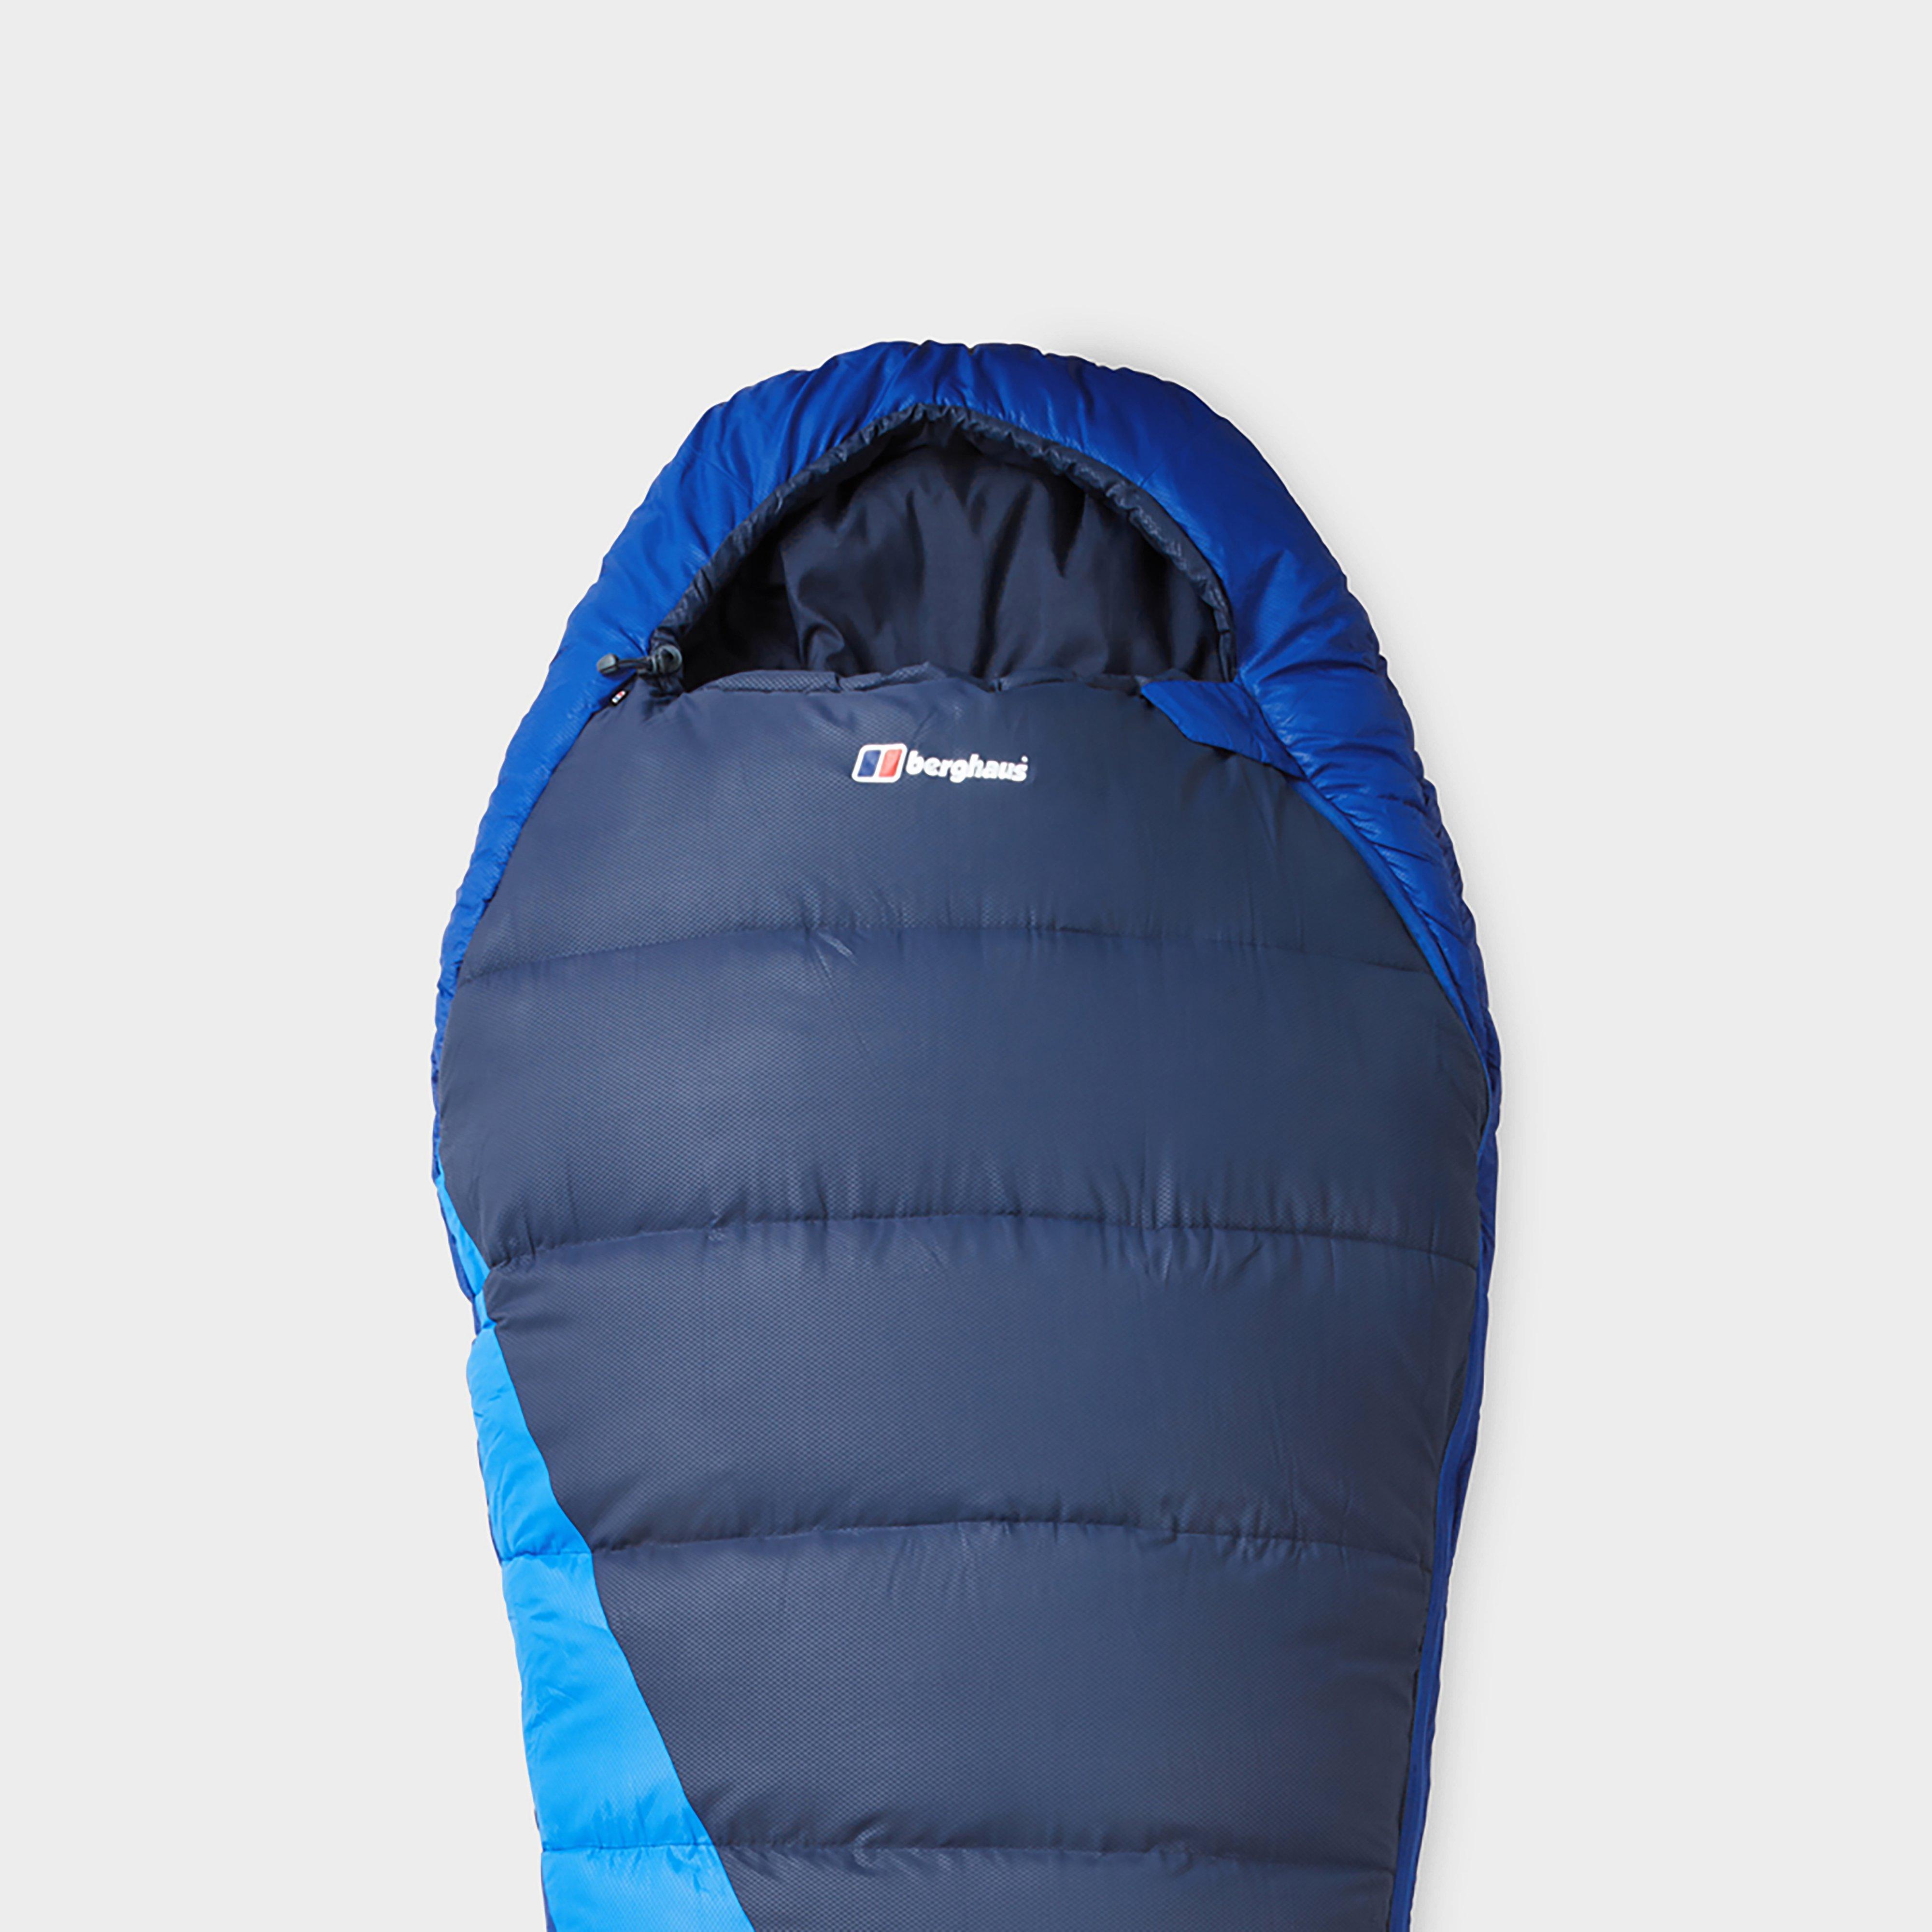 Berghaus Mens Transition 200xl Sleeping Bag - Blue  Blue